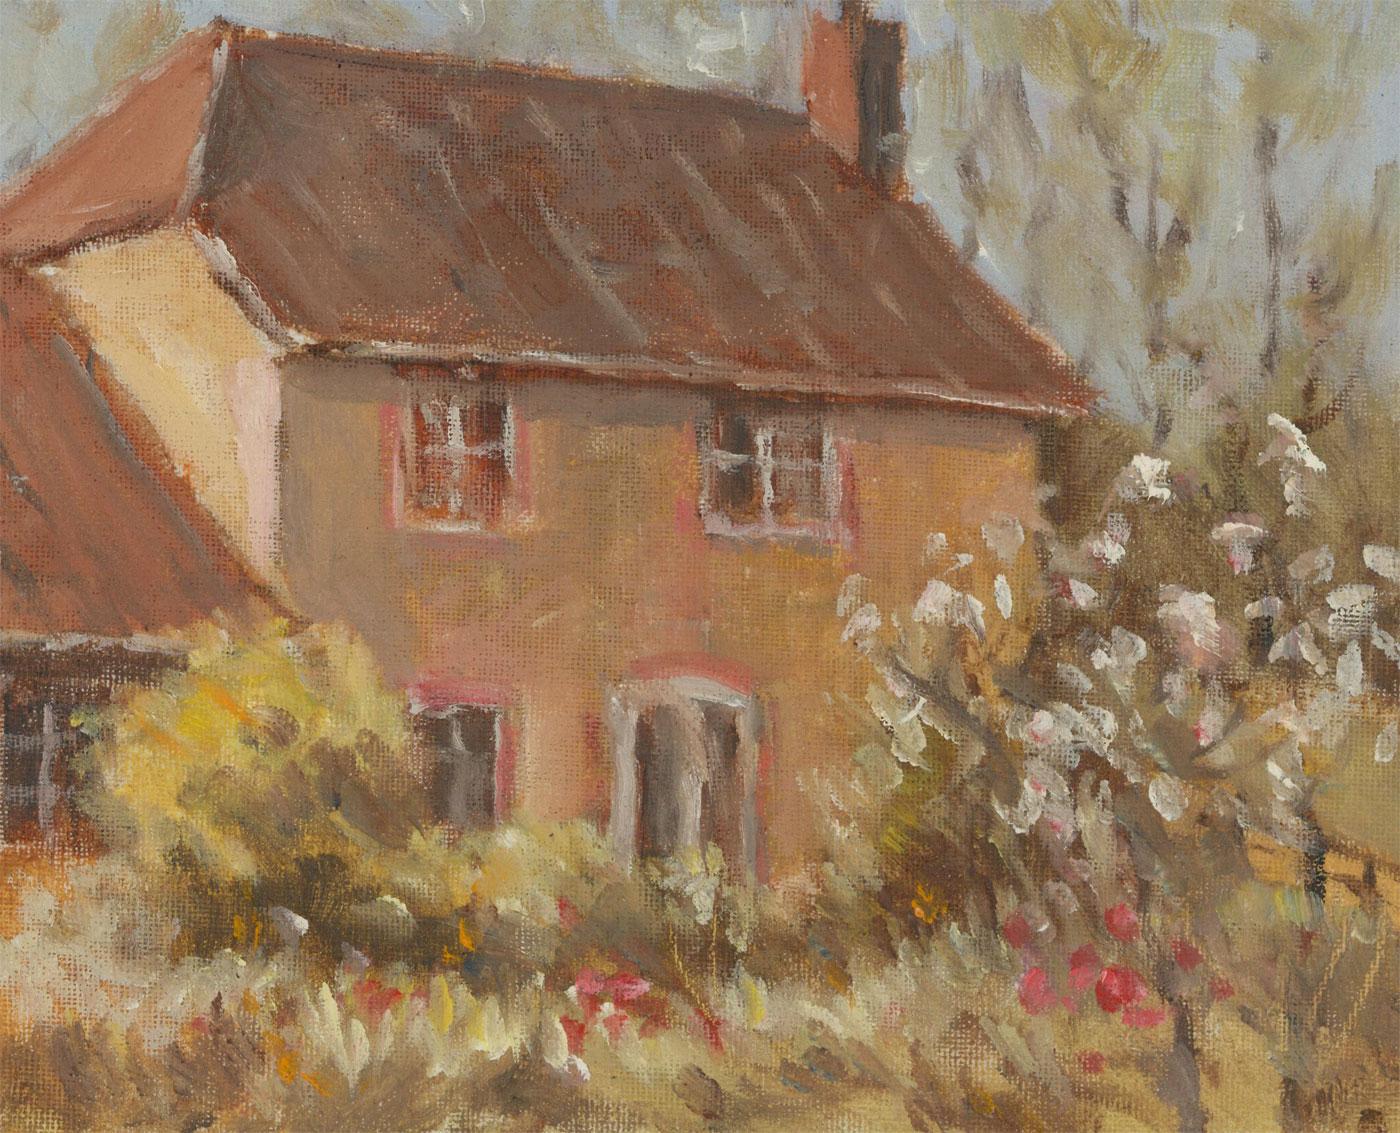 John A. Case - 20th Century Acrylic, A Rural Cottage